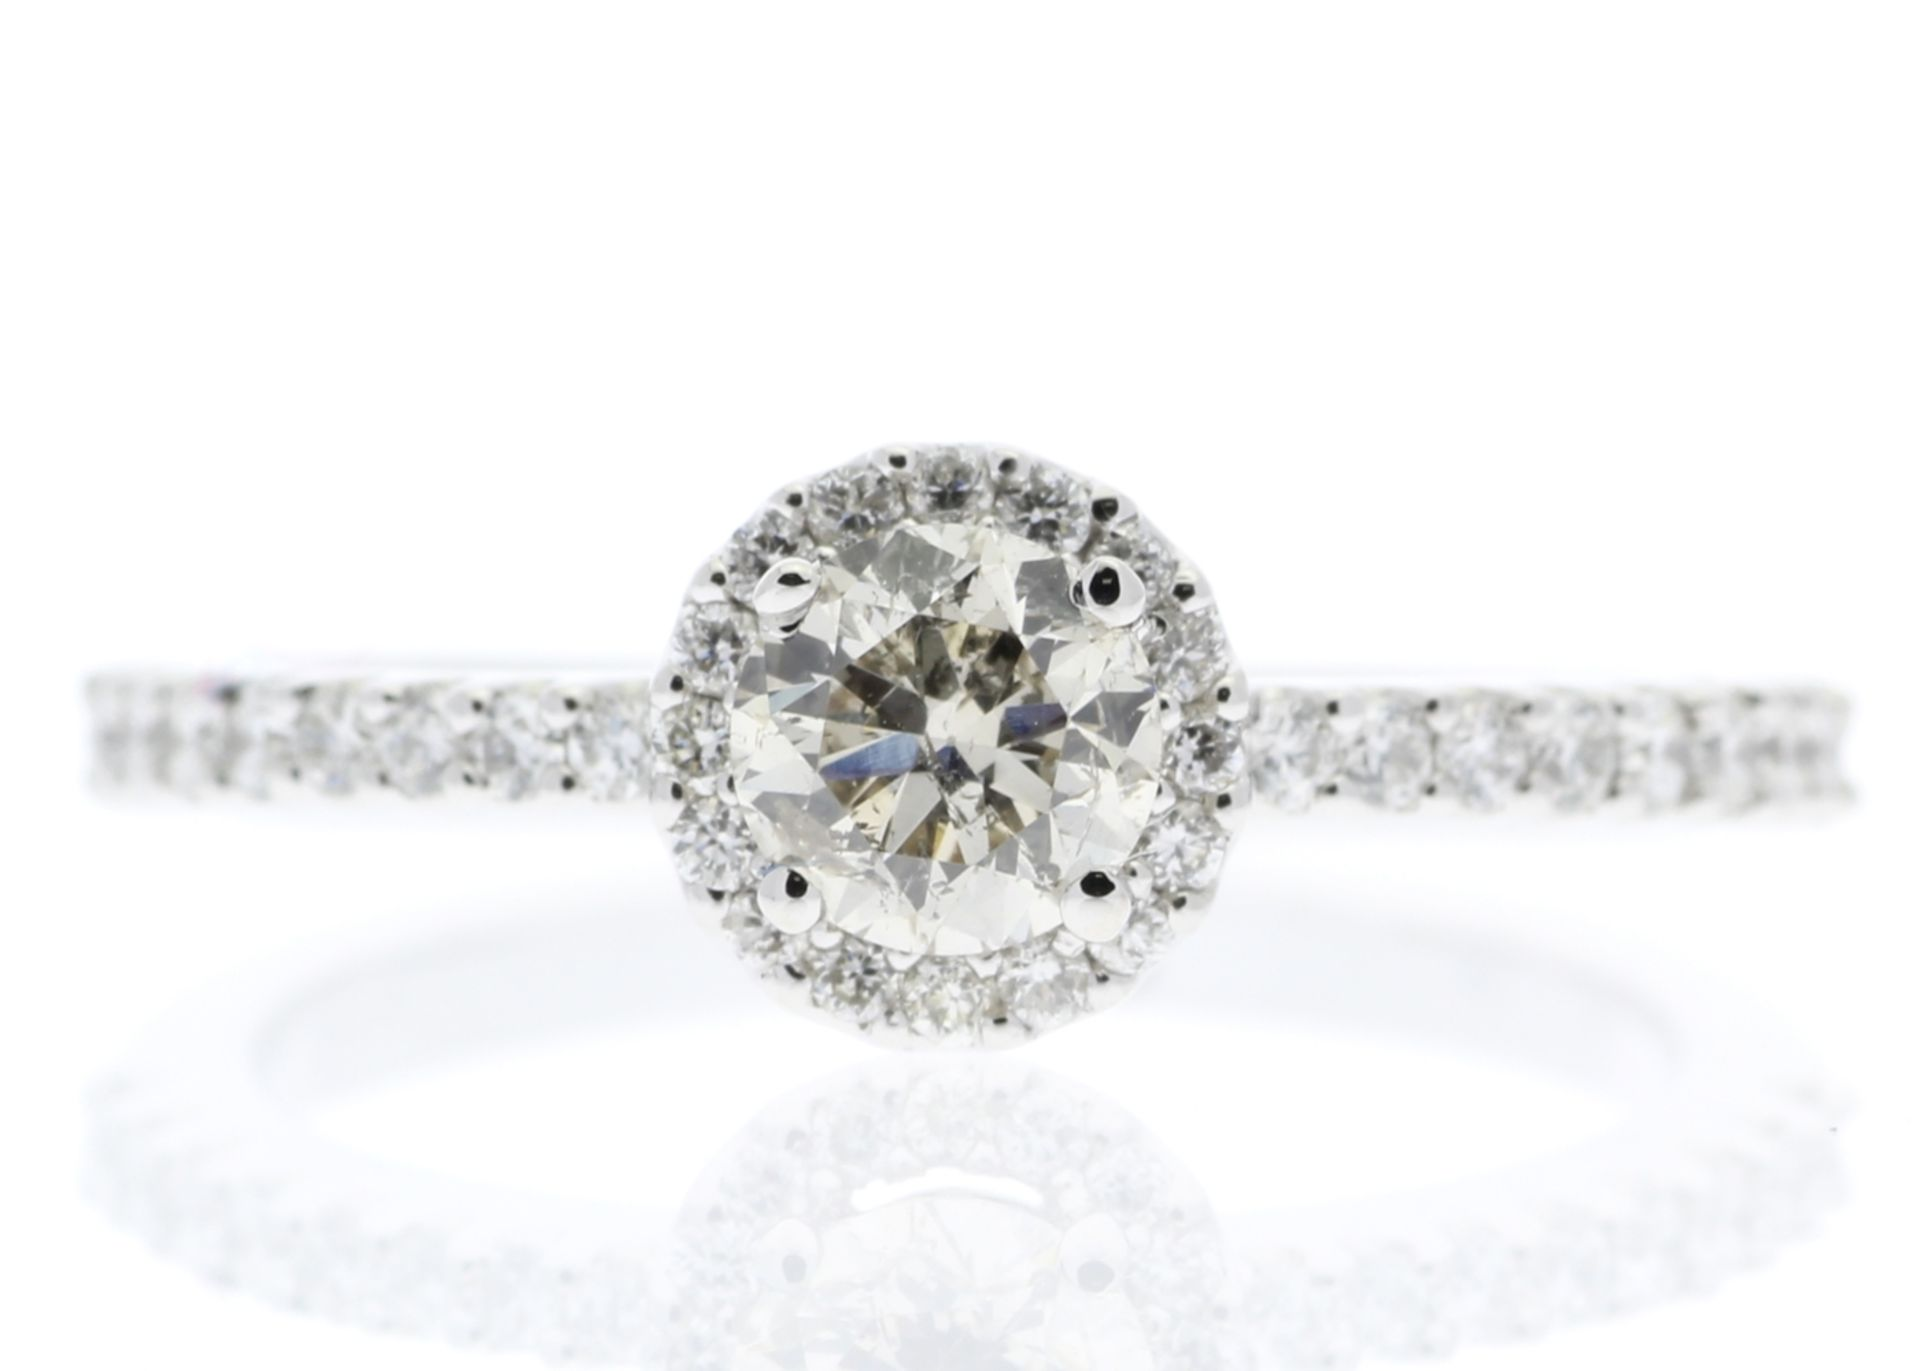 18ct White Gold Single Stone Halo Set With Stone Set Shoulders Diamond Ring (0.25) 0.52 Carats -